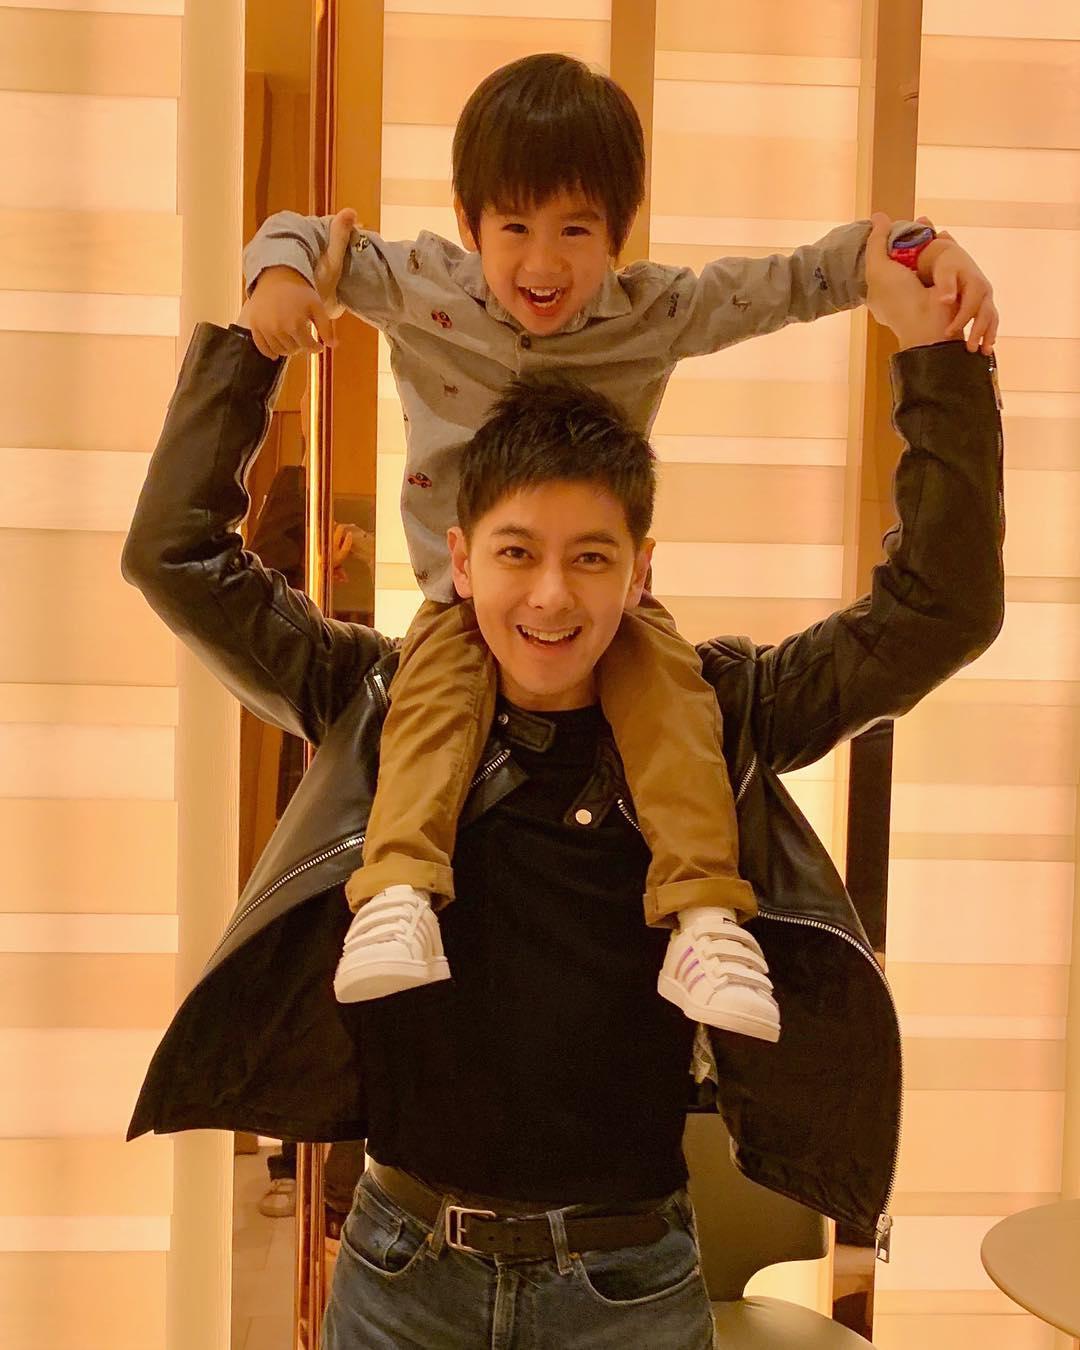 11 Potret harmonis keluarga Jimmy Lin, aktor multitalenta & awet muda